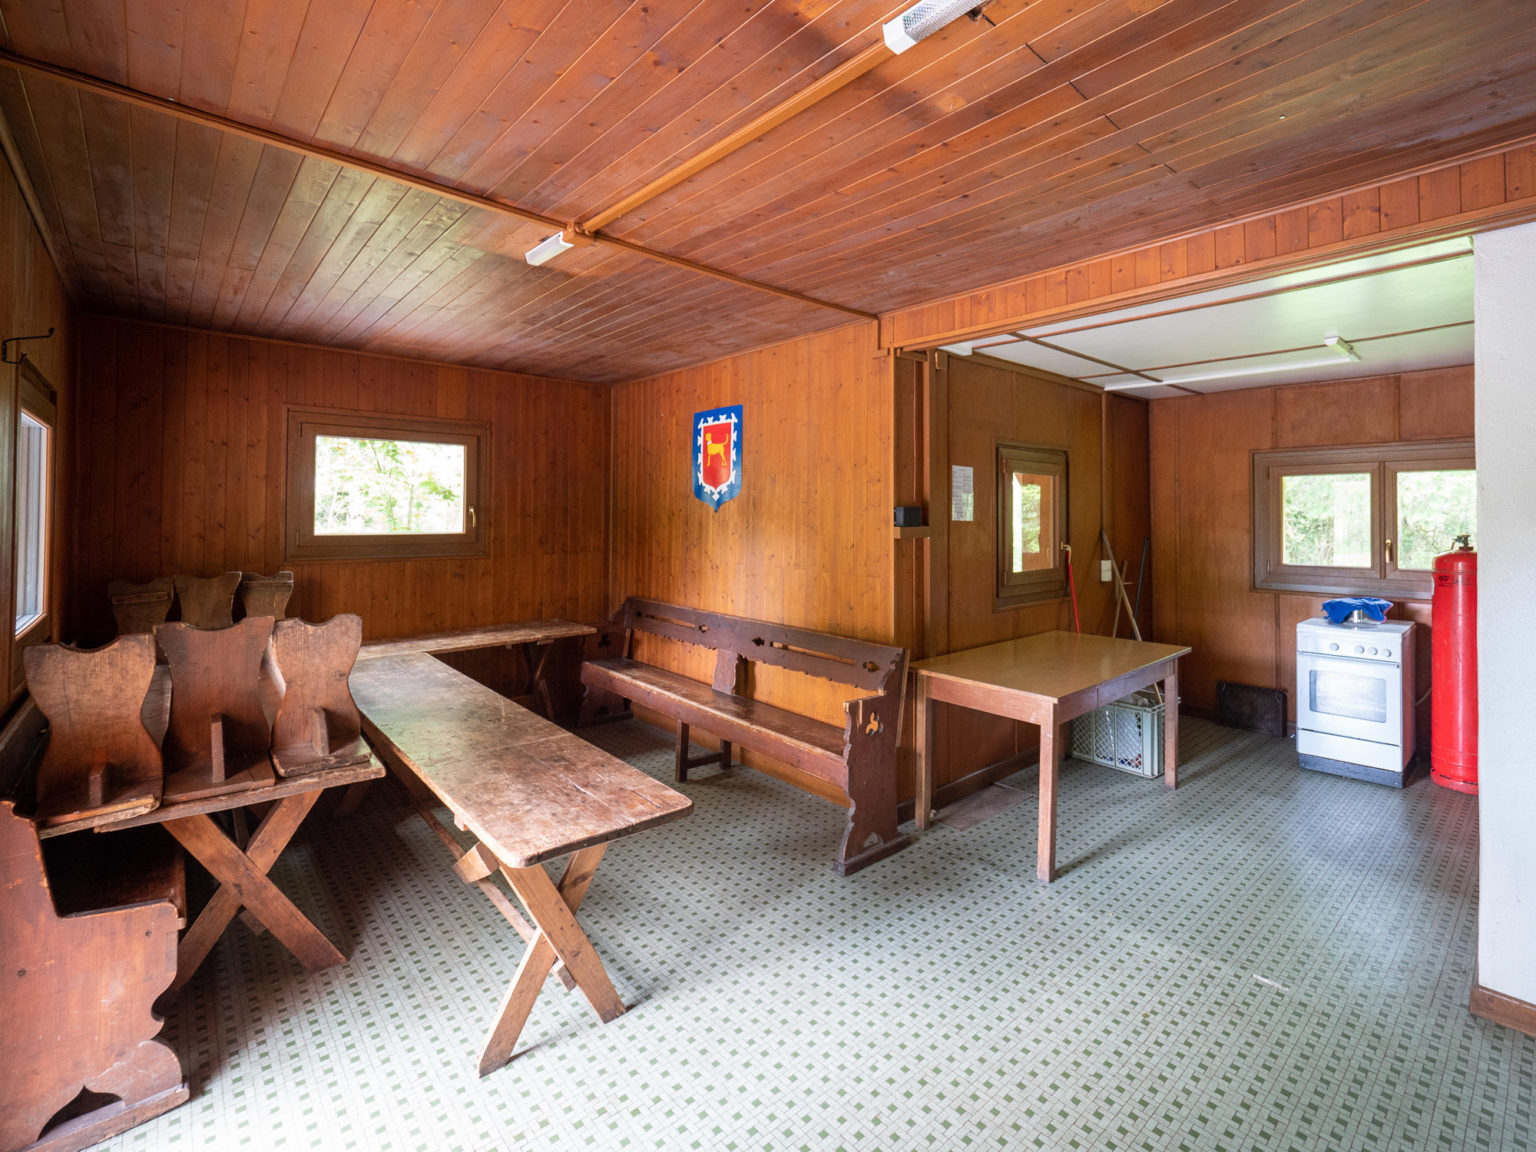 Refuges-salles-Montanaire©V-Dubach-52733